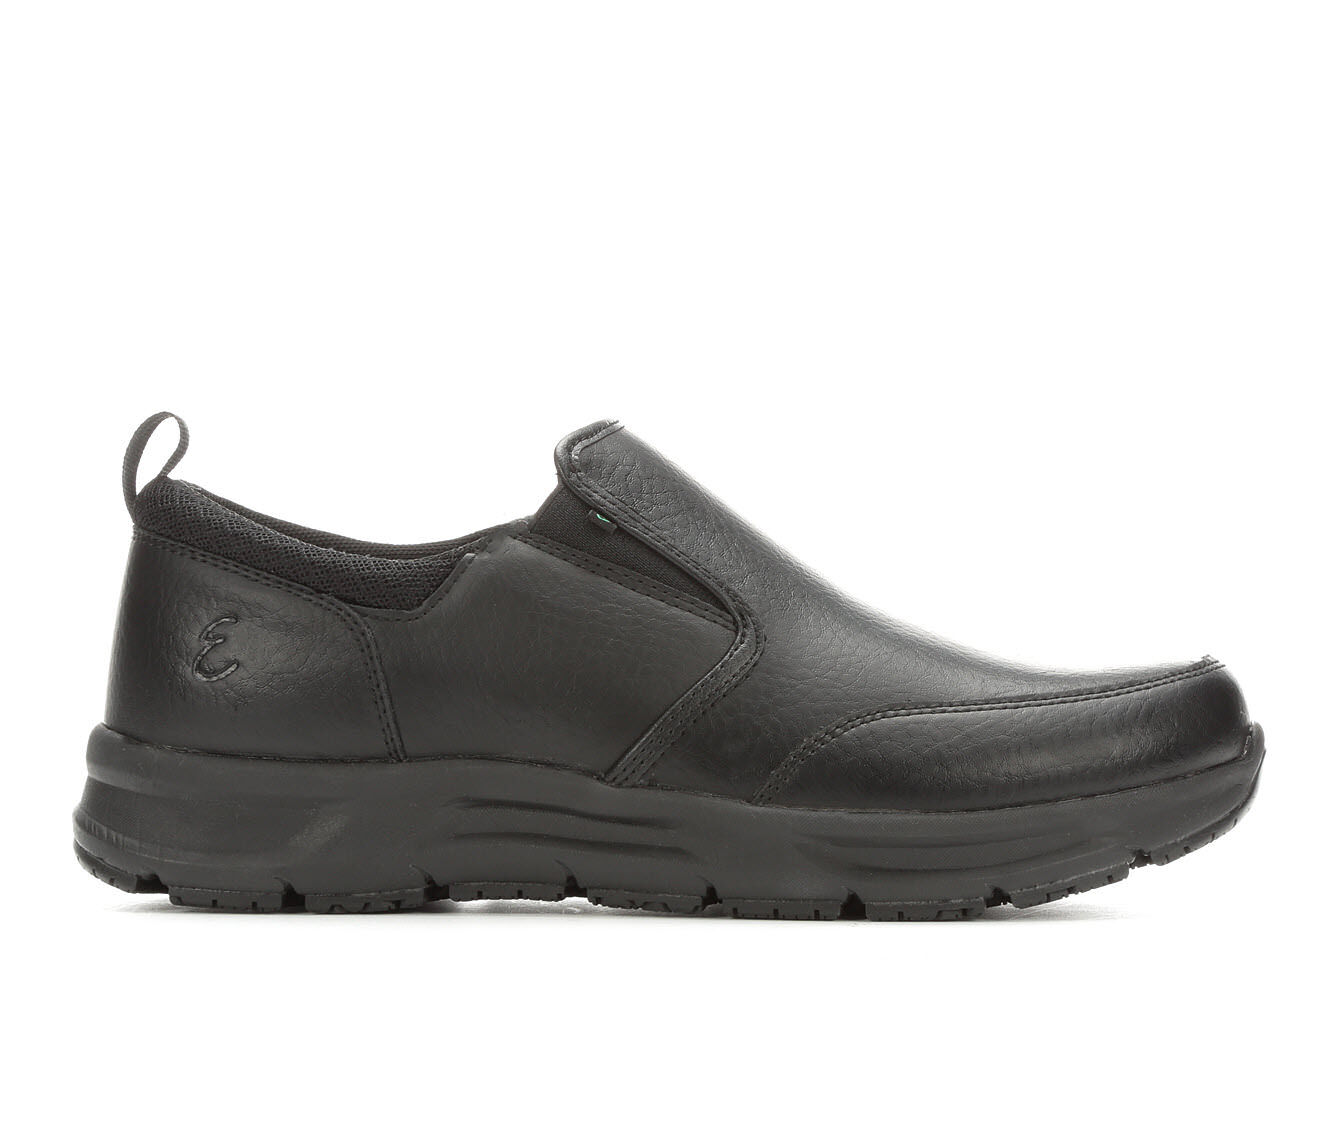 Men's Emeril Lagasse Quarter Slip On Safety Shoes Black